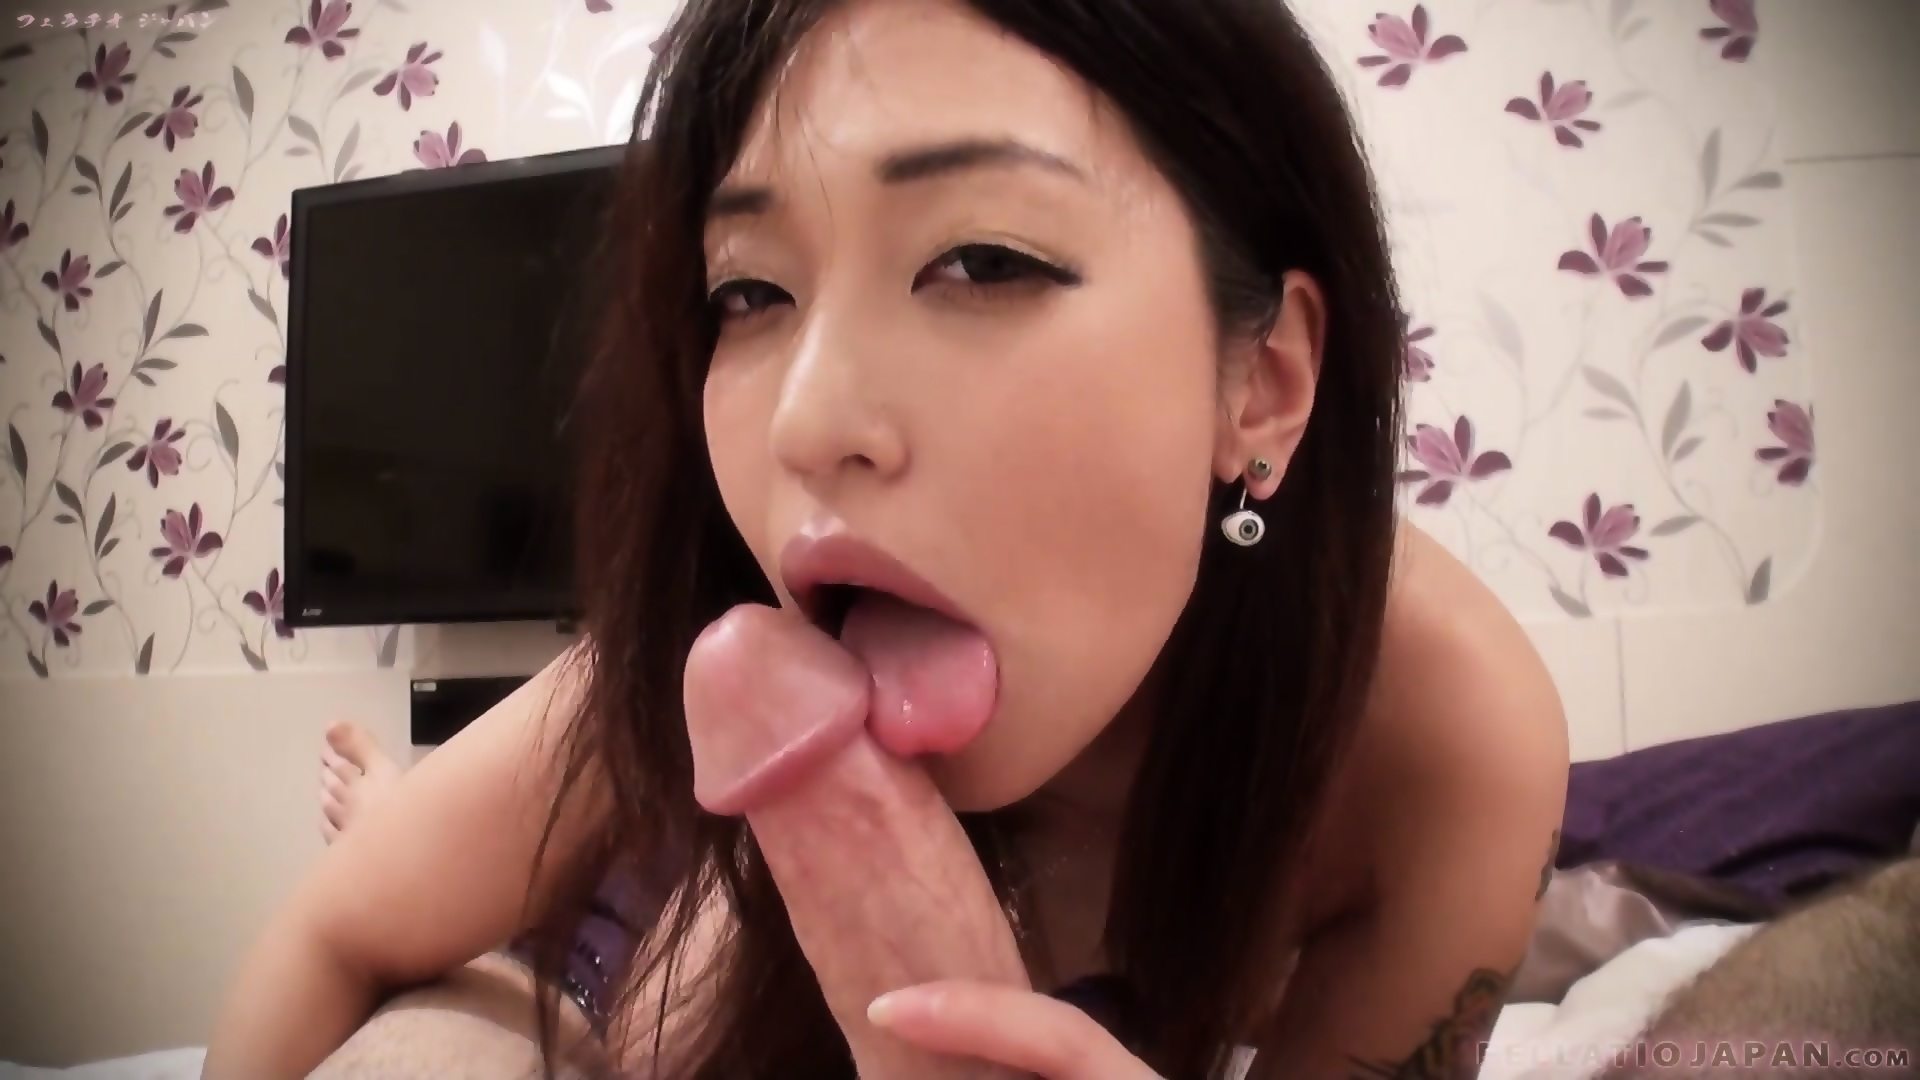 California anal girls dvd Amateur